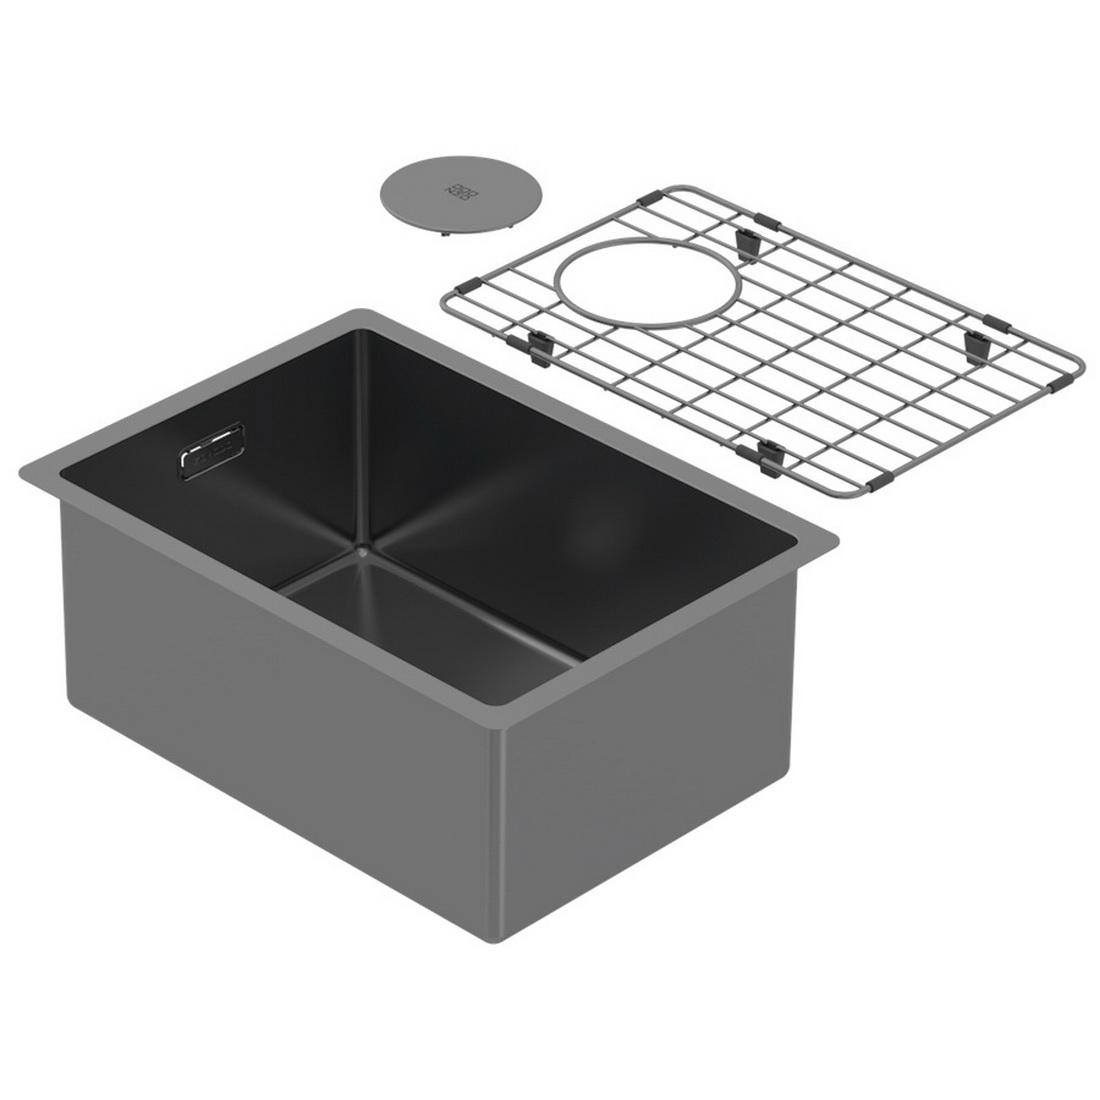 320x440x180mm Single Bowl Undermount Kitchen Sink Cayman Black PearlArc Finish